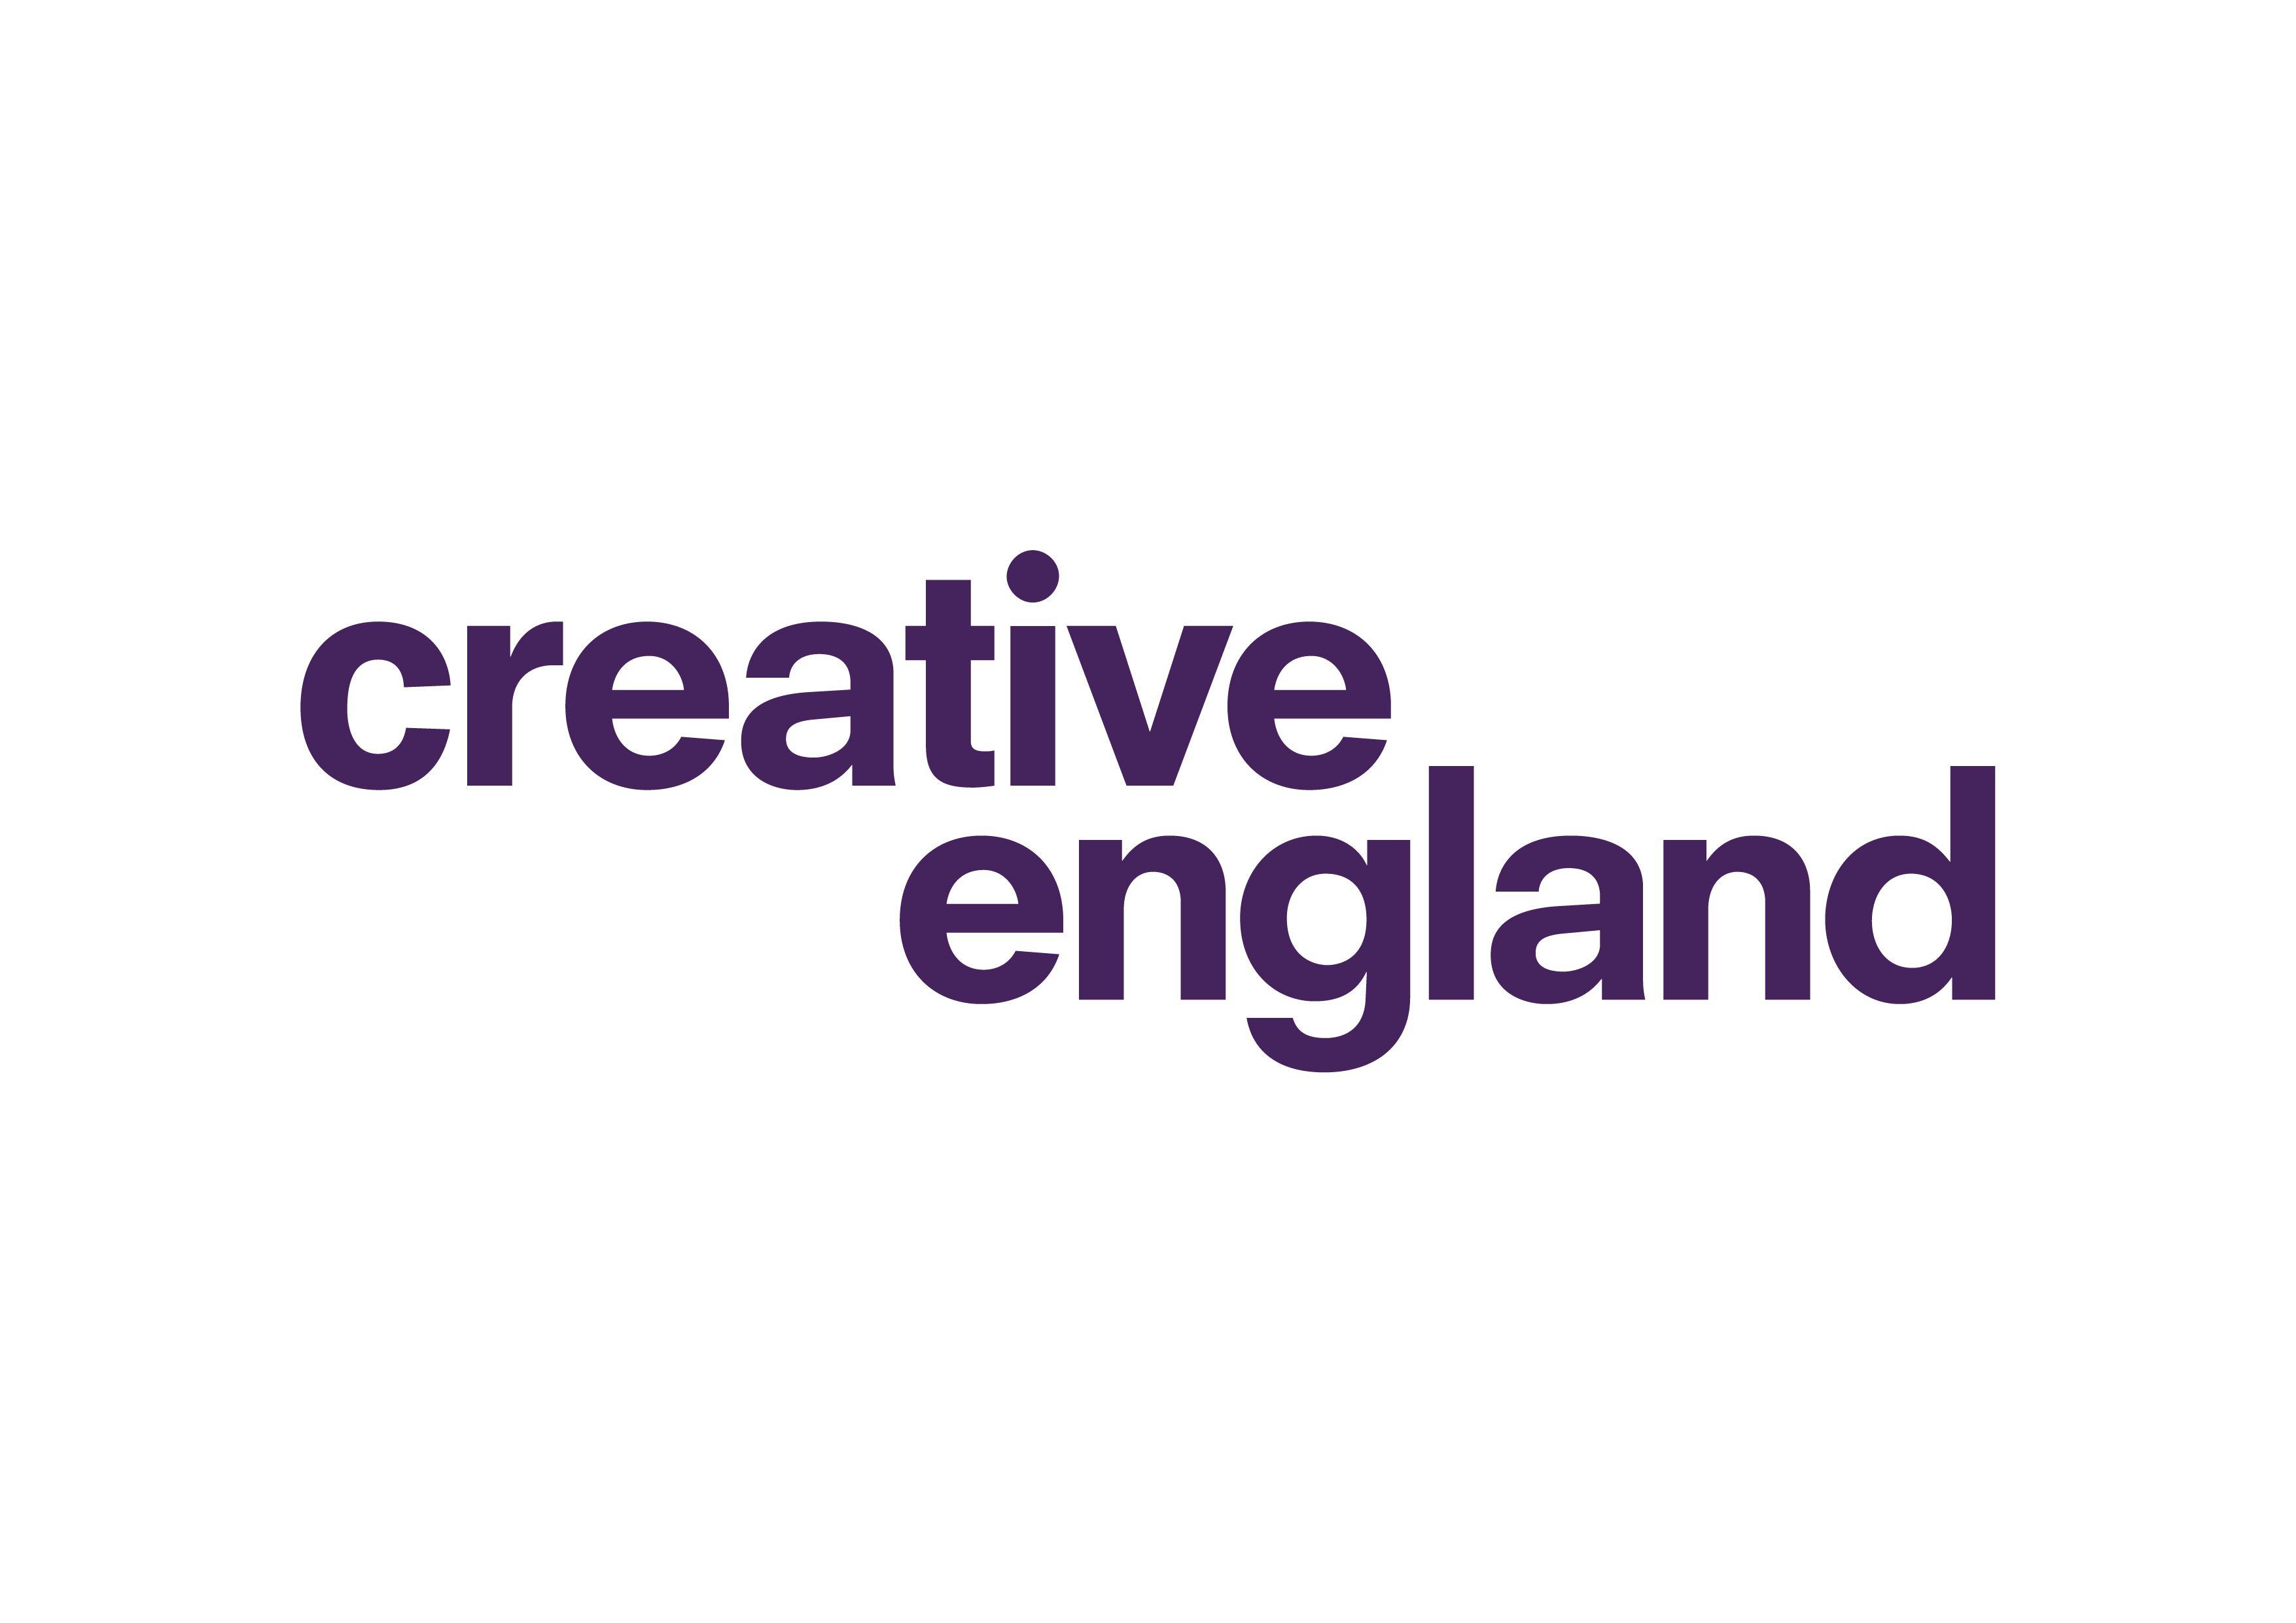 Creative England